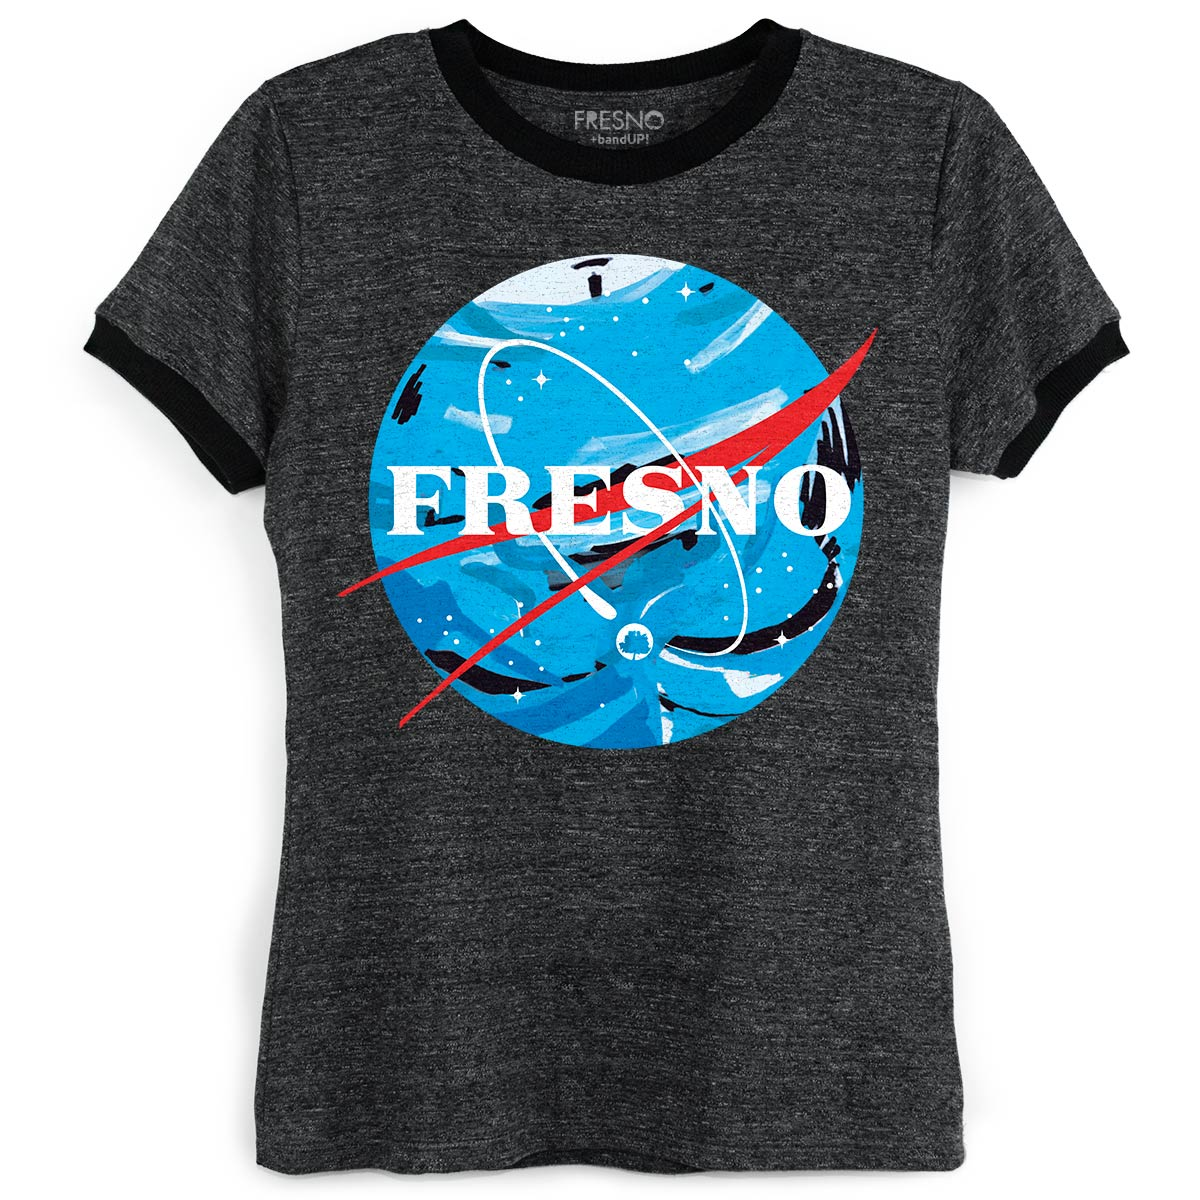 Camiseta Ringer Feminina Fresno Programa Espacial